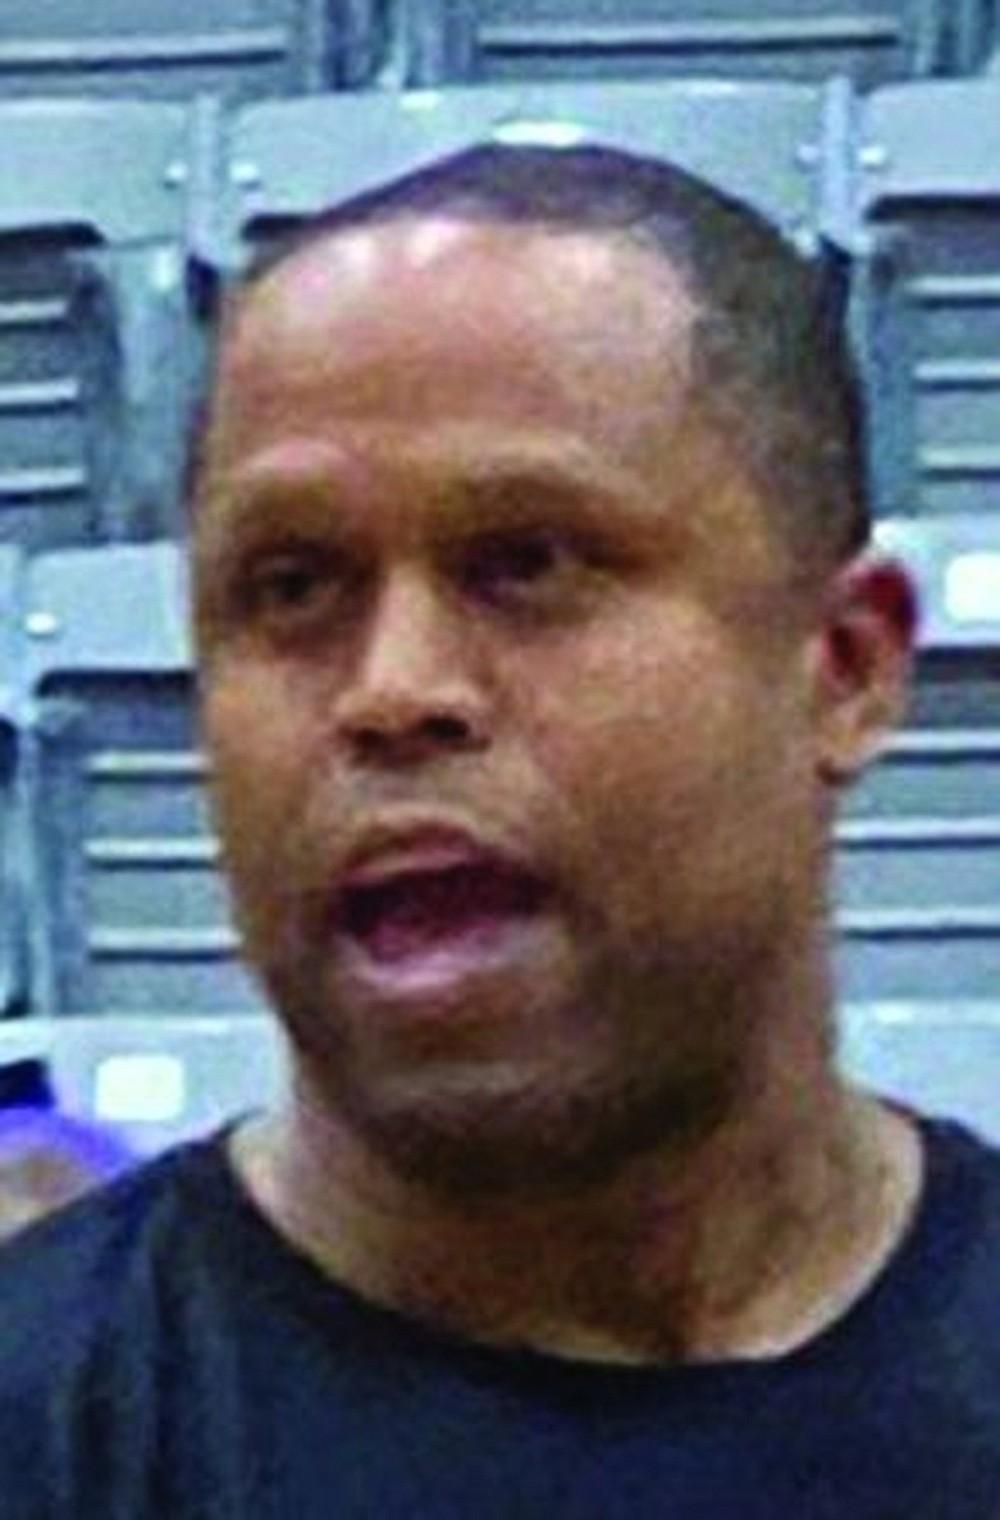 Coach Anthony Boone